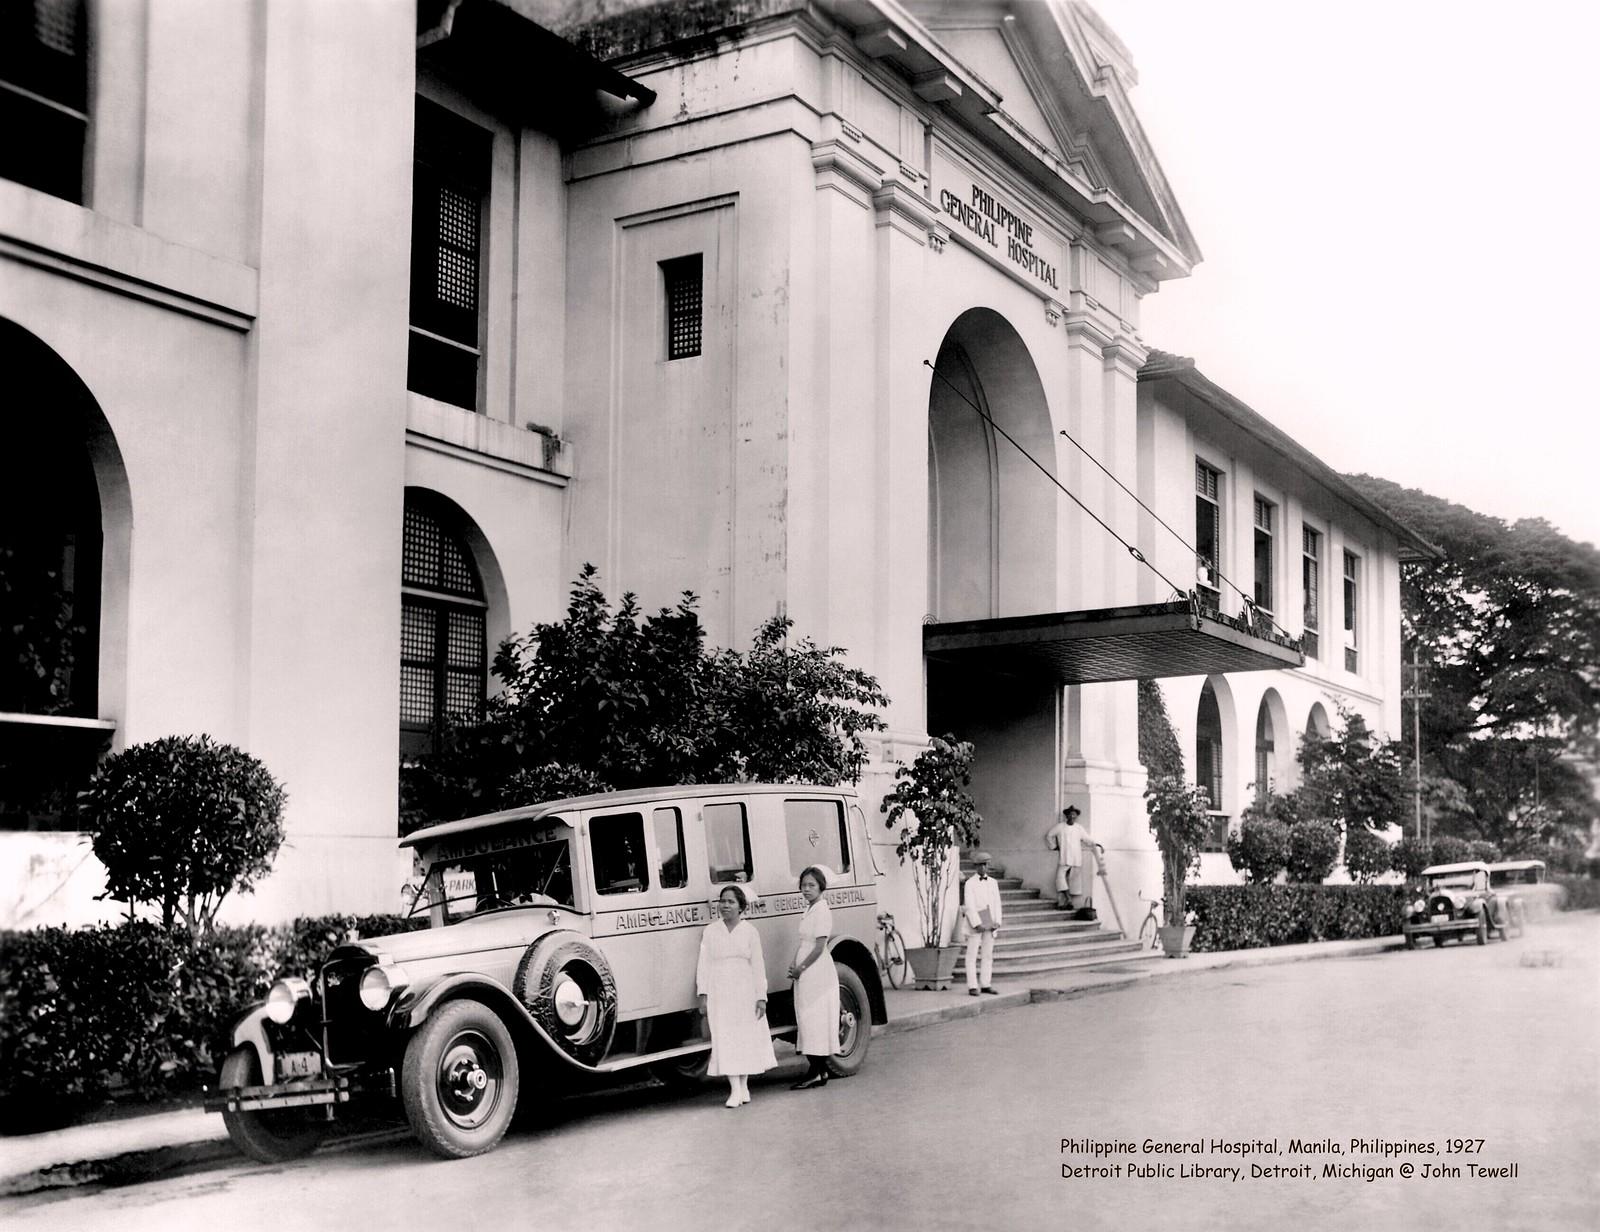 Philippine General Hospital, Manila, Philippines, 1927